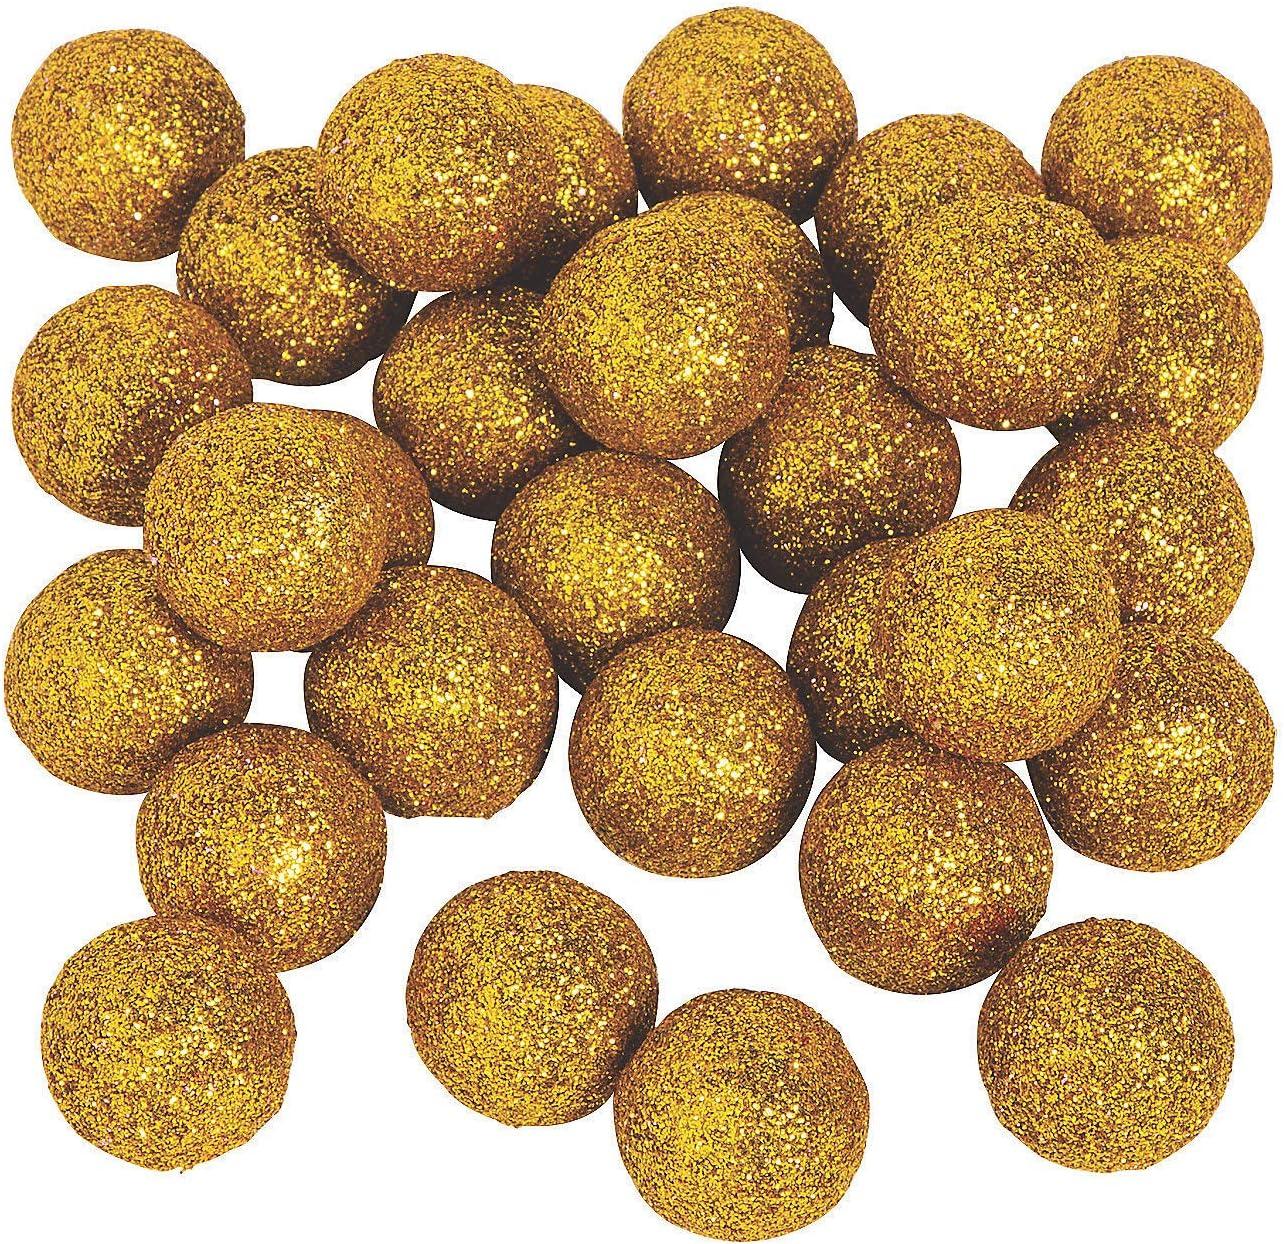 Gold Glitter Ball Vase Fresno Mall Filler - Party Pieces Decor Philadelphia Mall 40